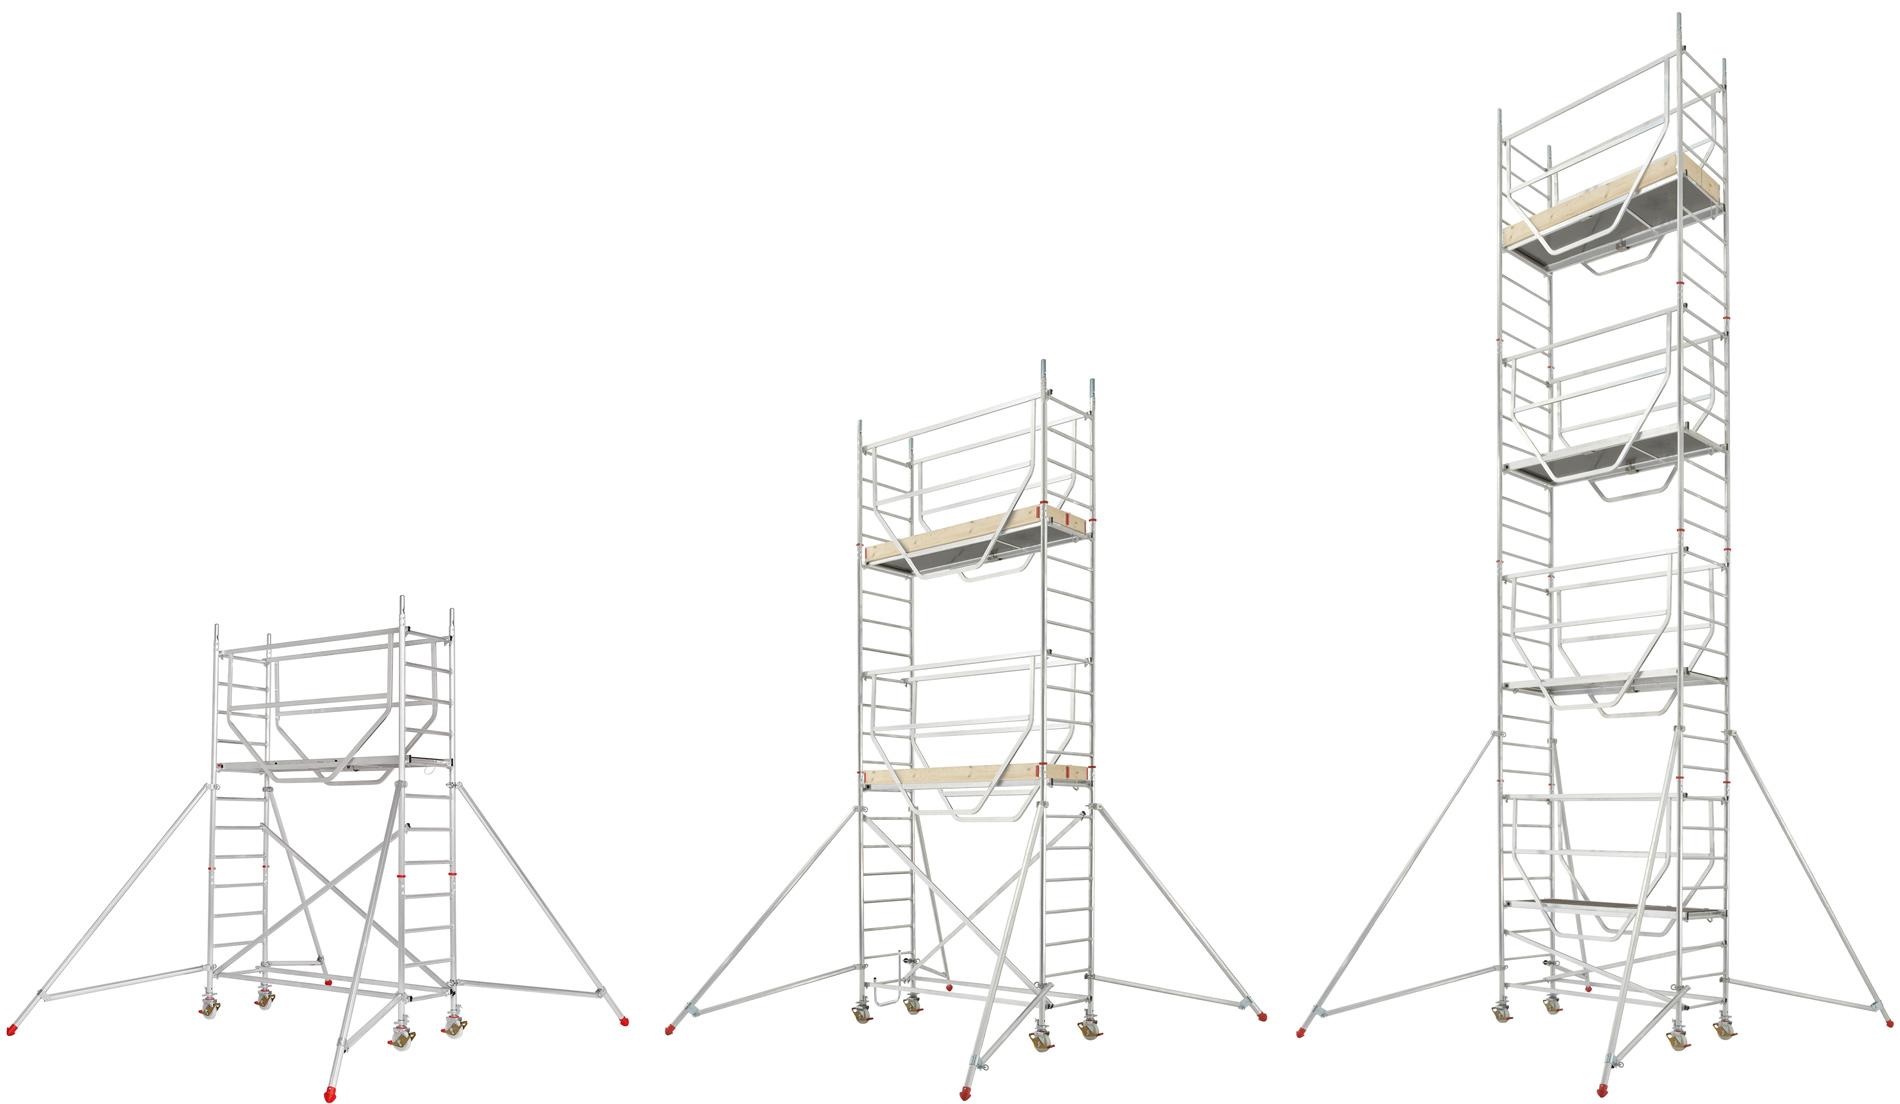 Hymer Fahrgerüst ADVANCED SAFE-T 0,72 x 2,08 m